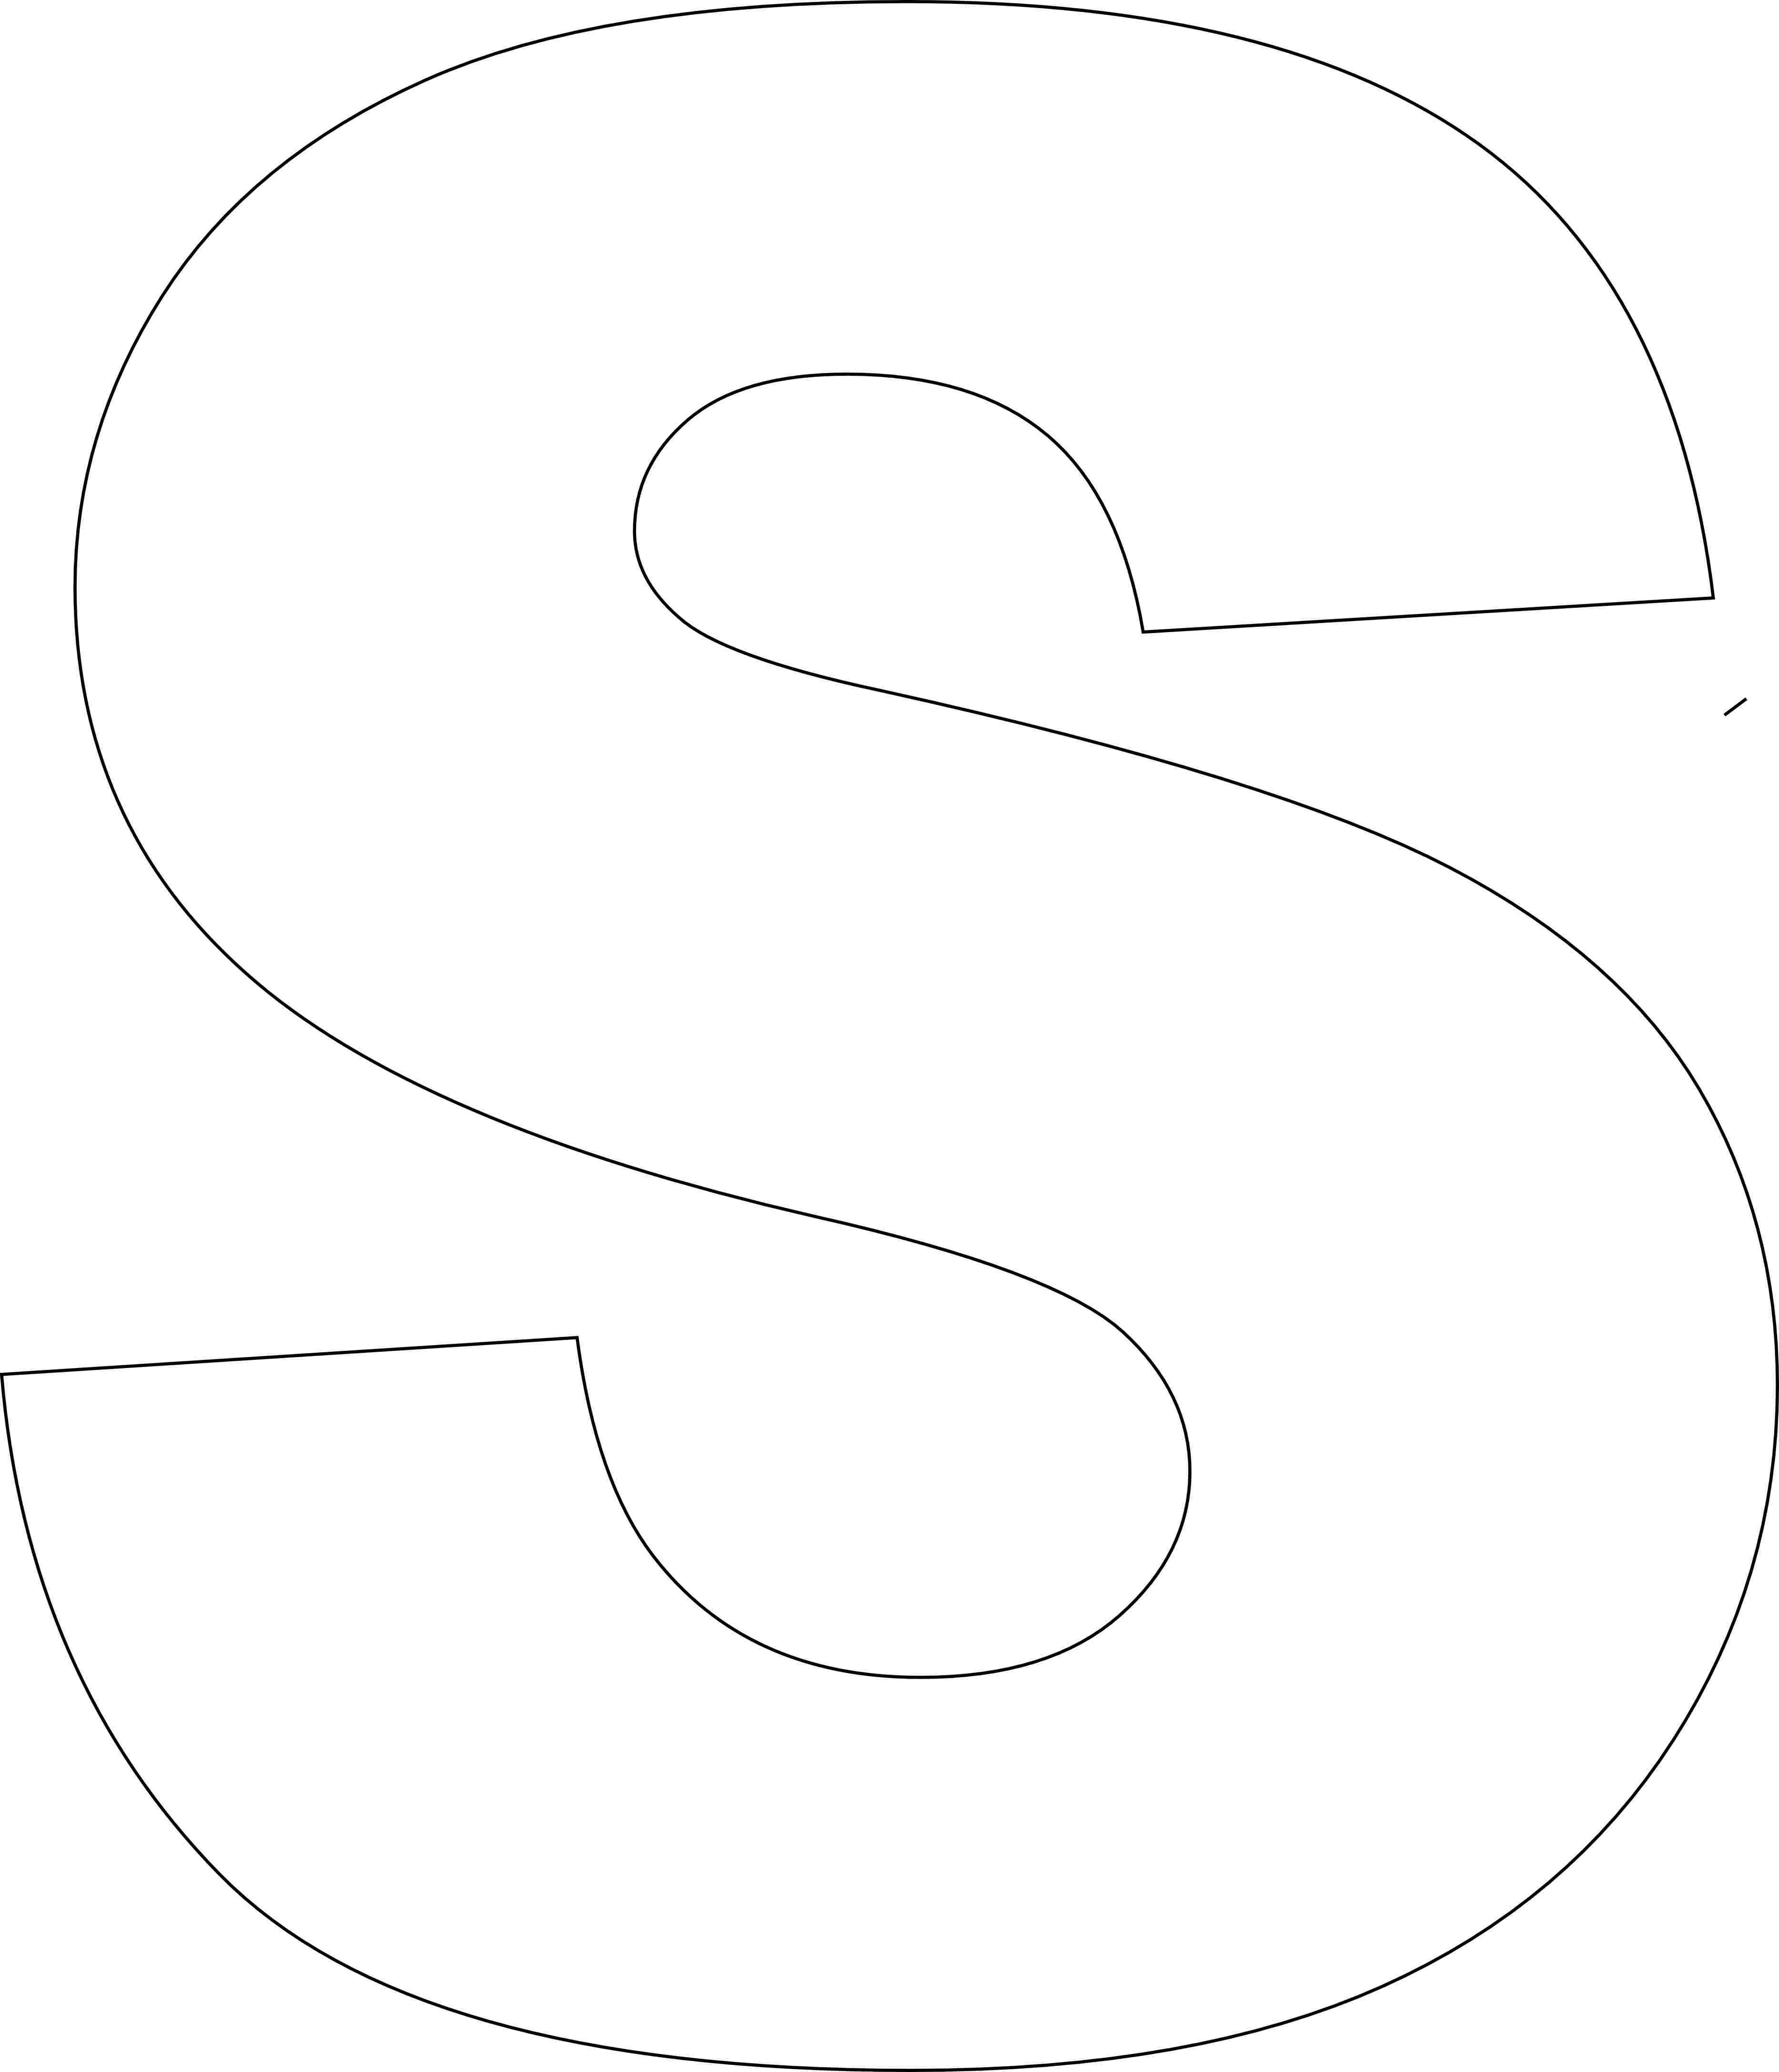 Free Printable Alphabet Template Upper Case - Free Printable Large Uppercase Alphabet Letters